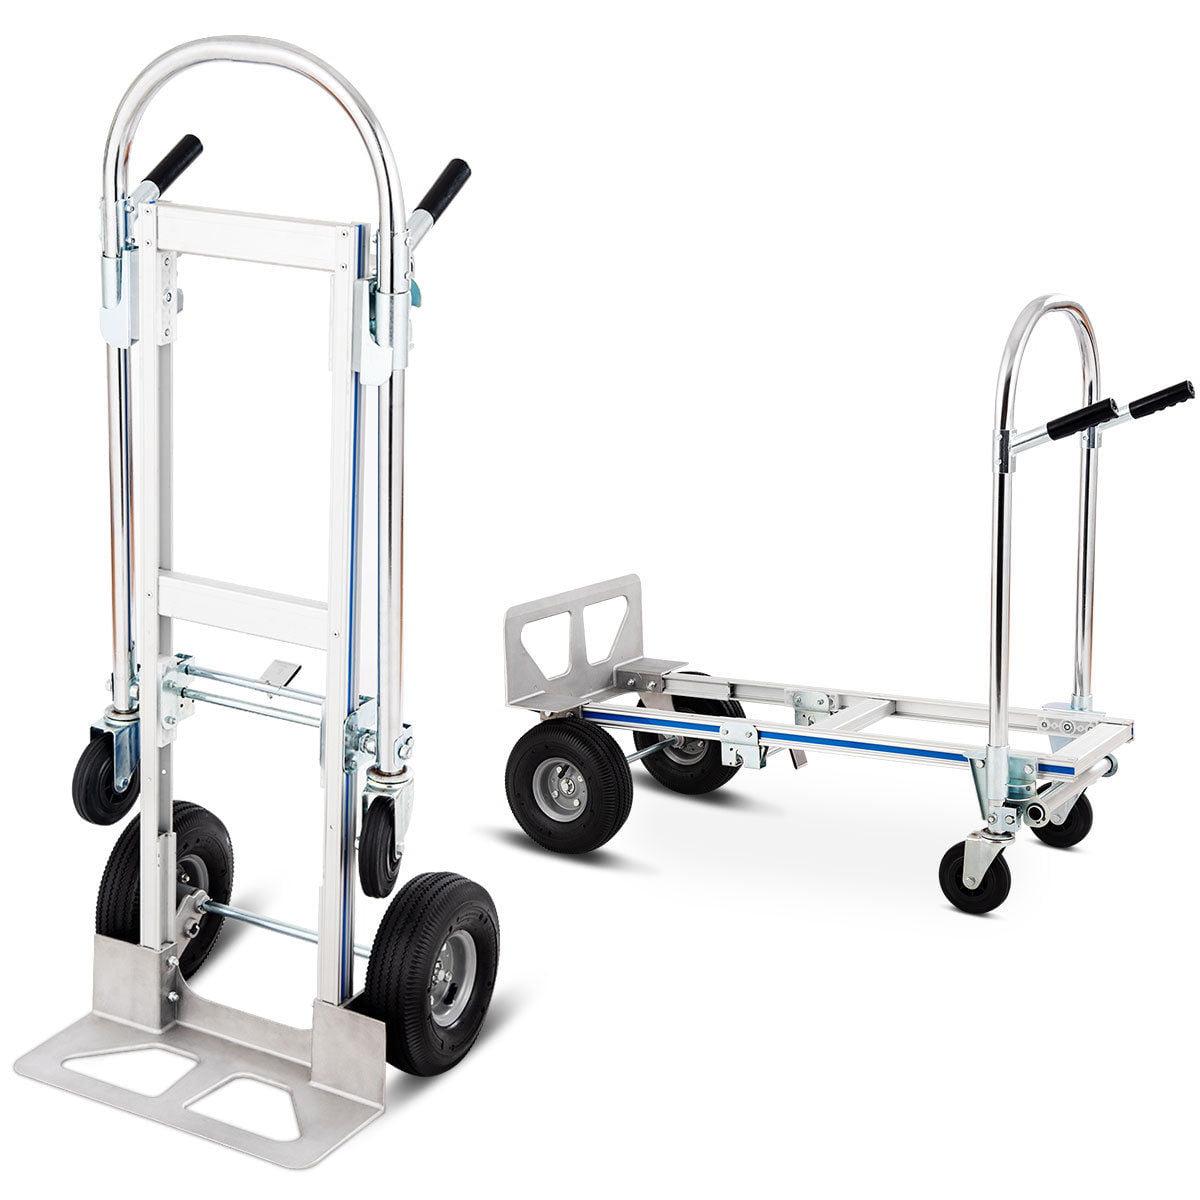 Costway 2in1 Aluminum Hand Truck Convertible Folding Dolly Platform Cart 770LBS Capacity